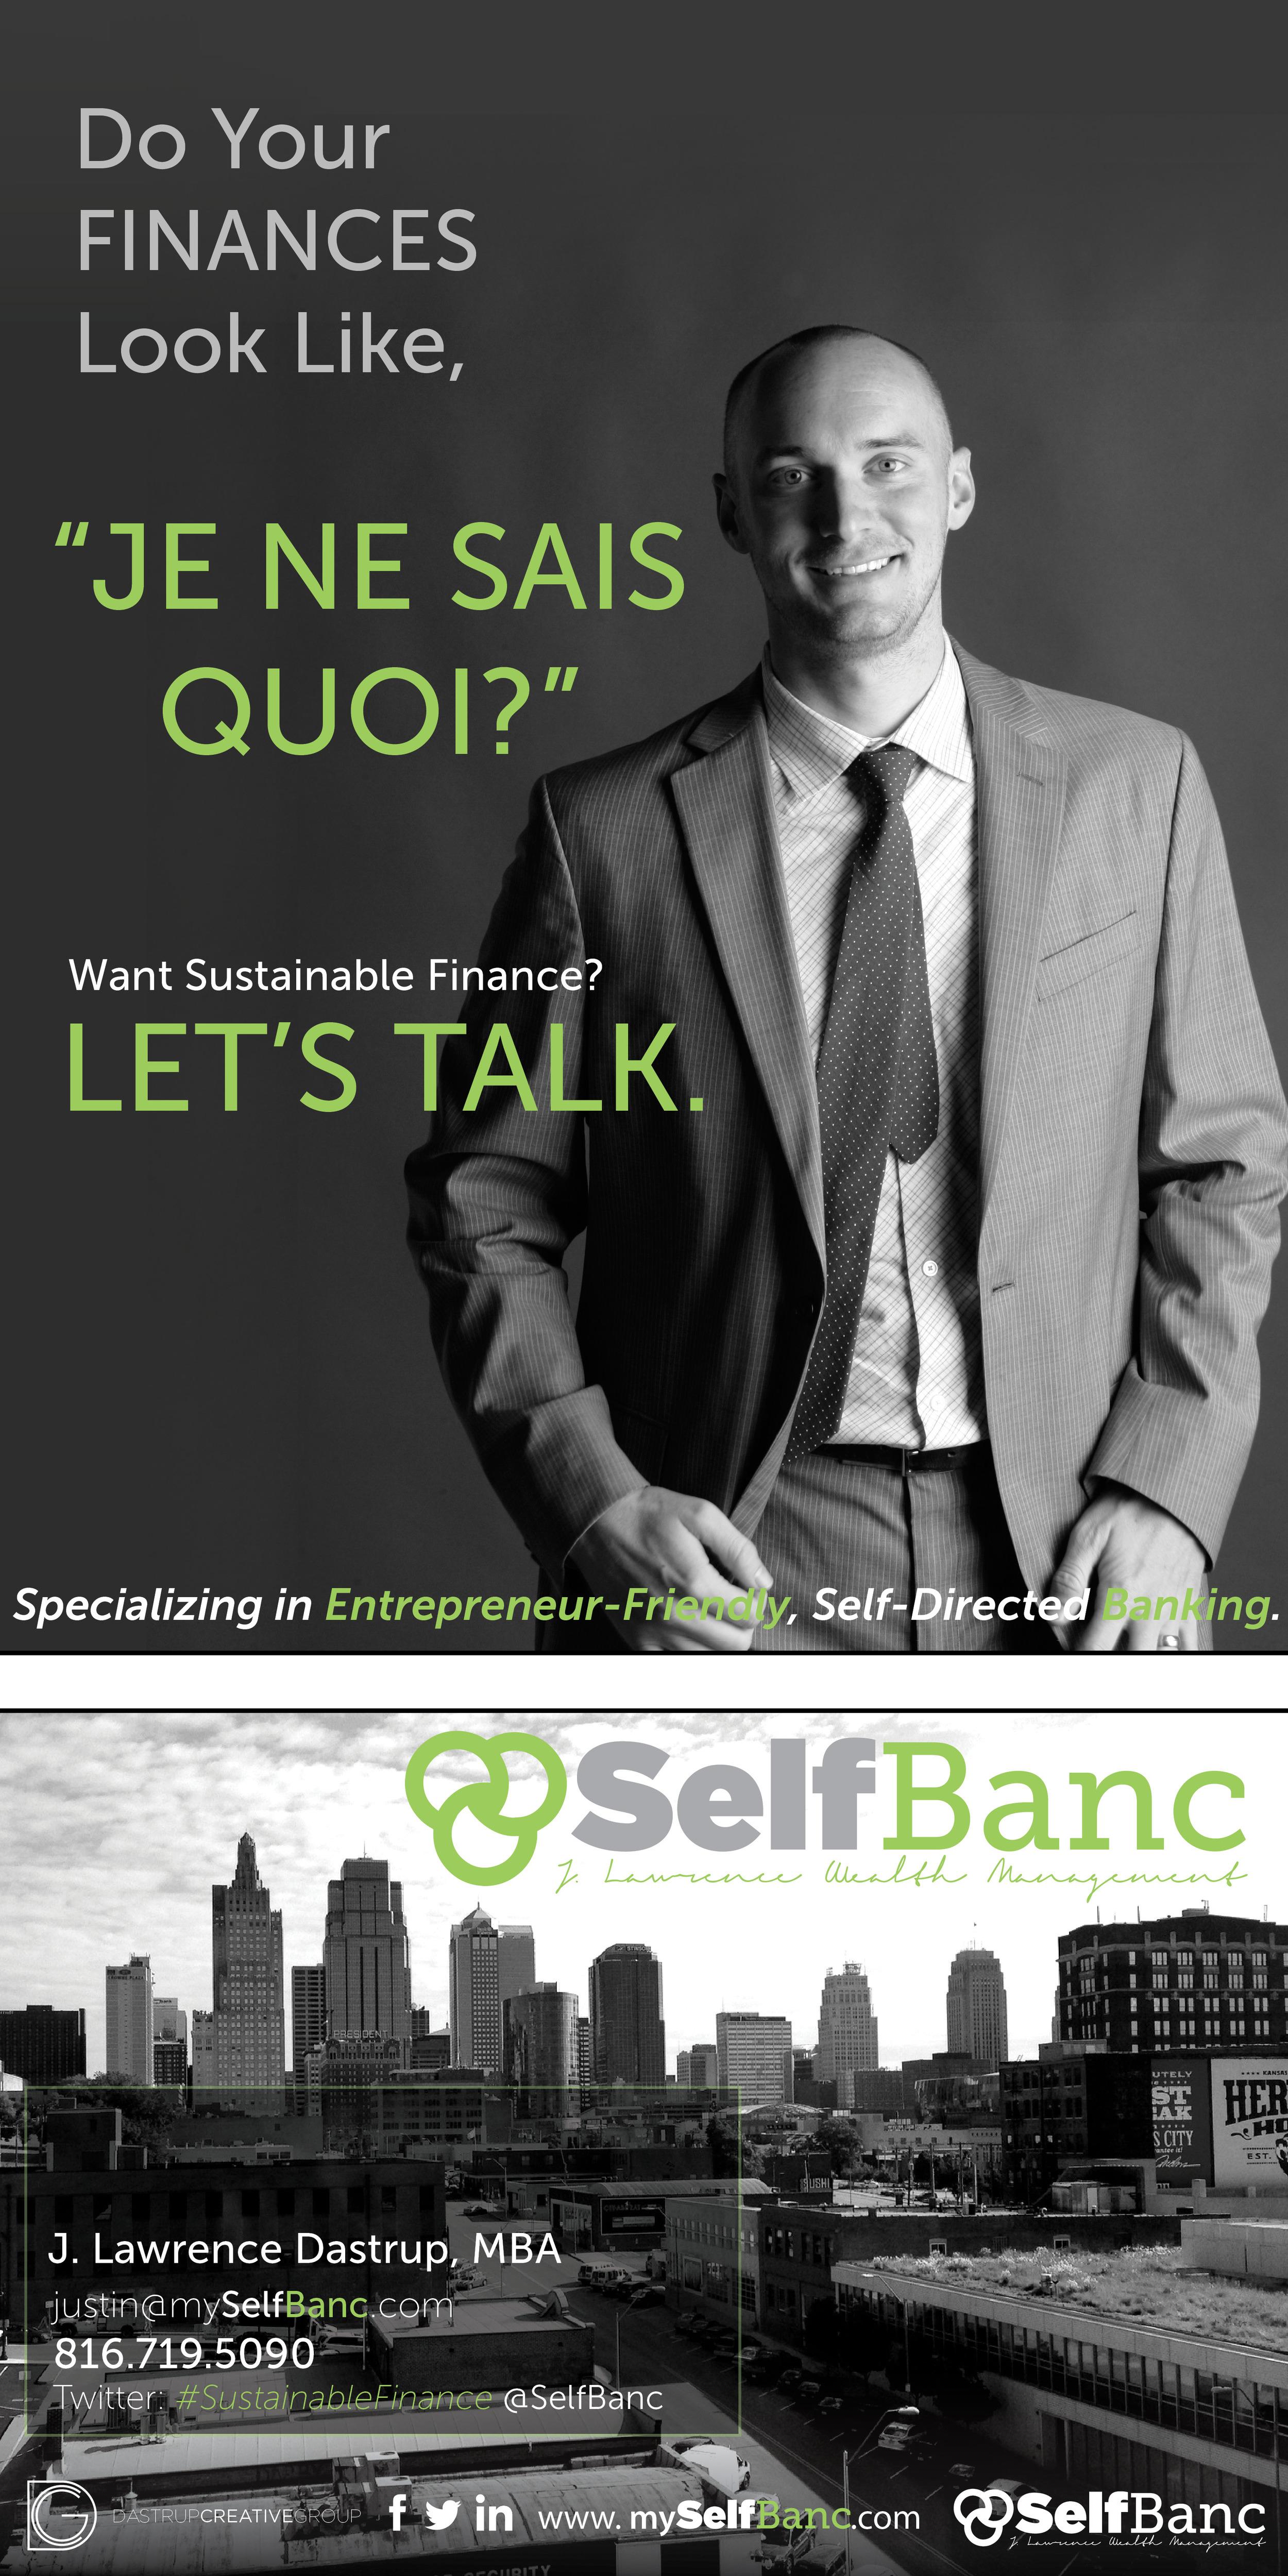 SelfBanc AL Web Ad.jpg